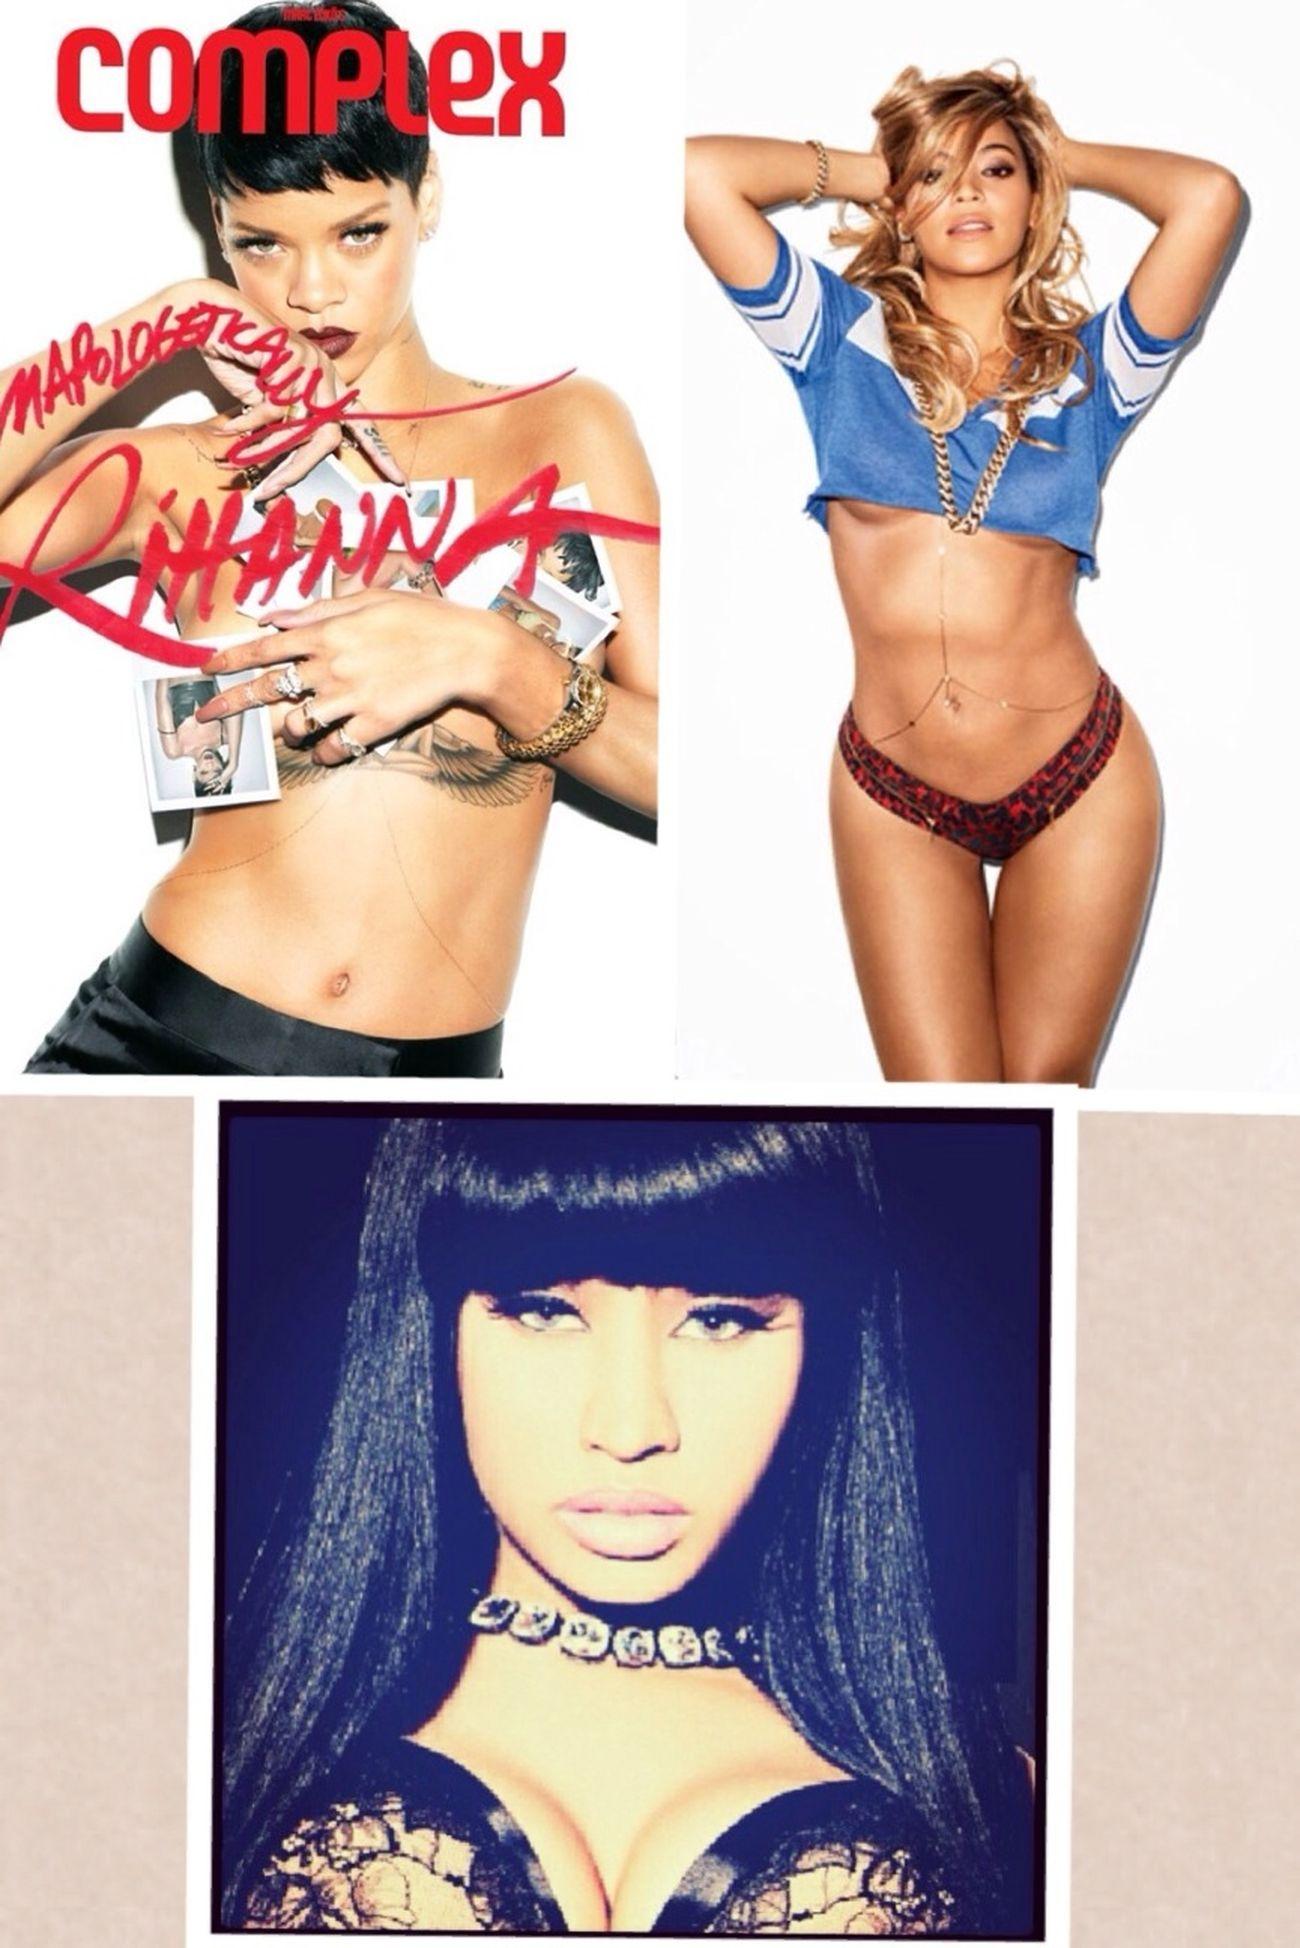 my 3 favs